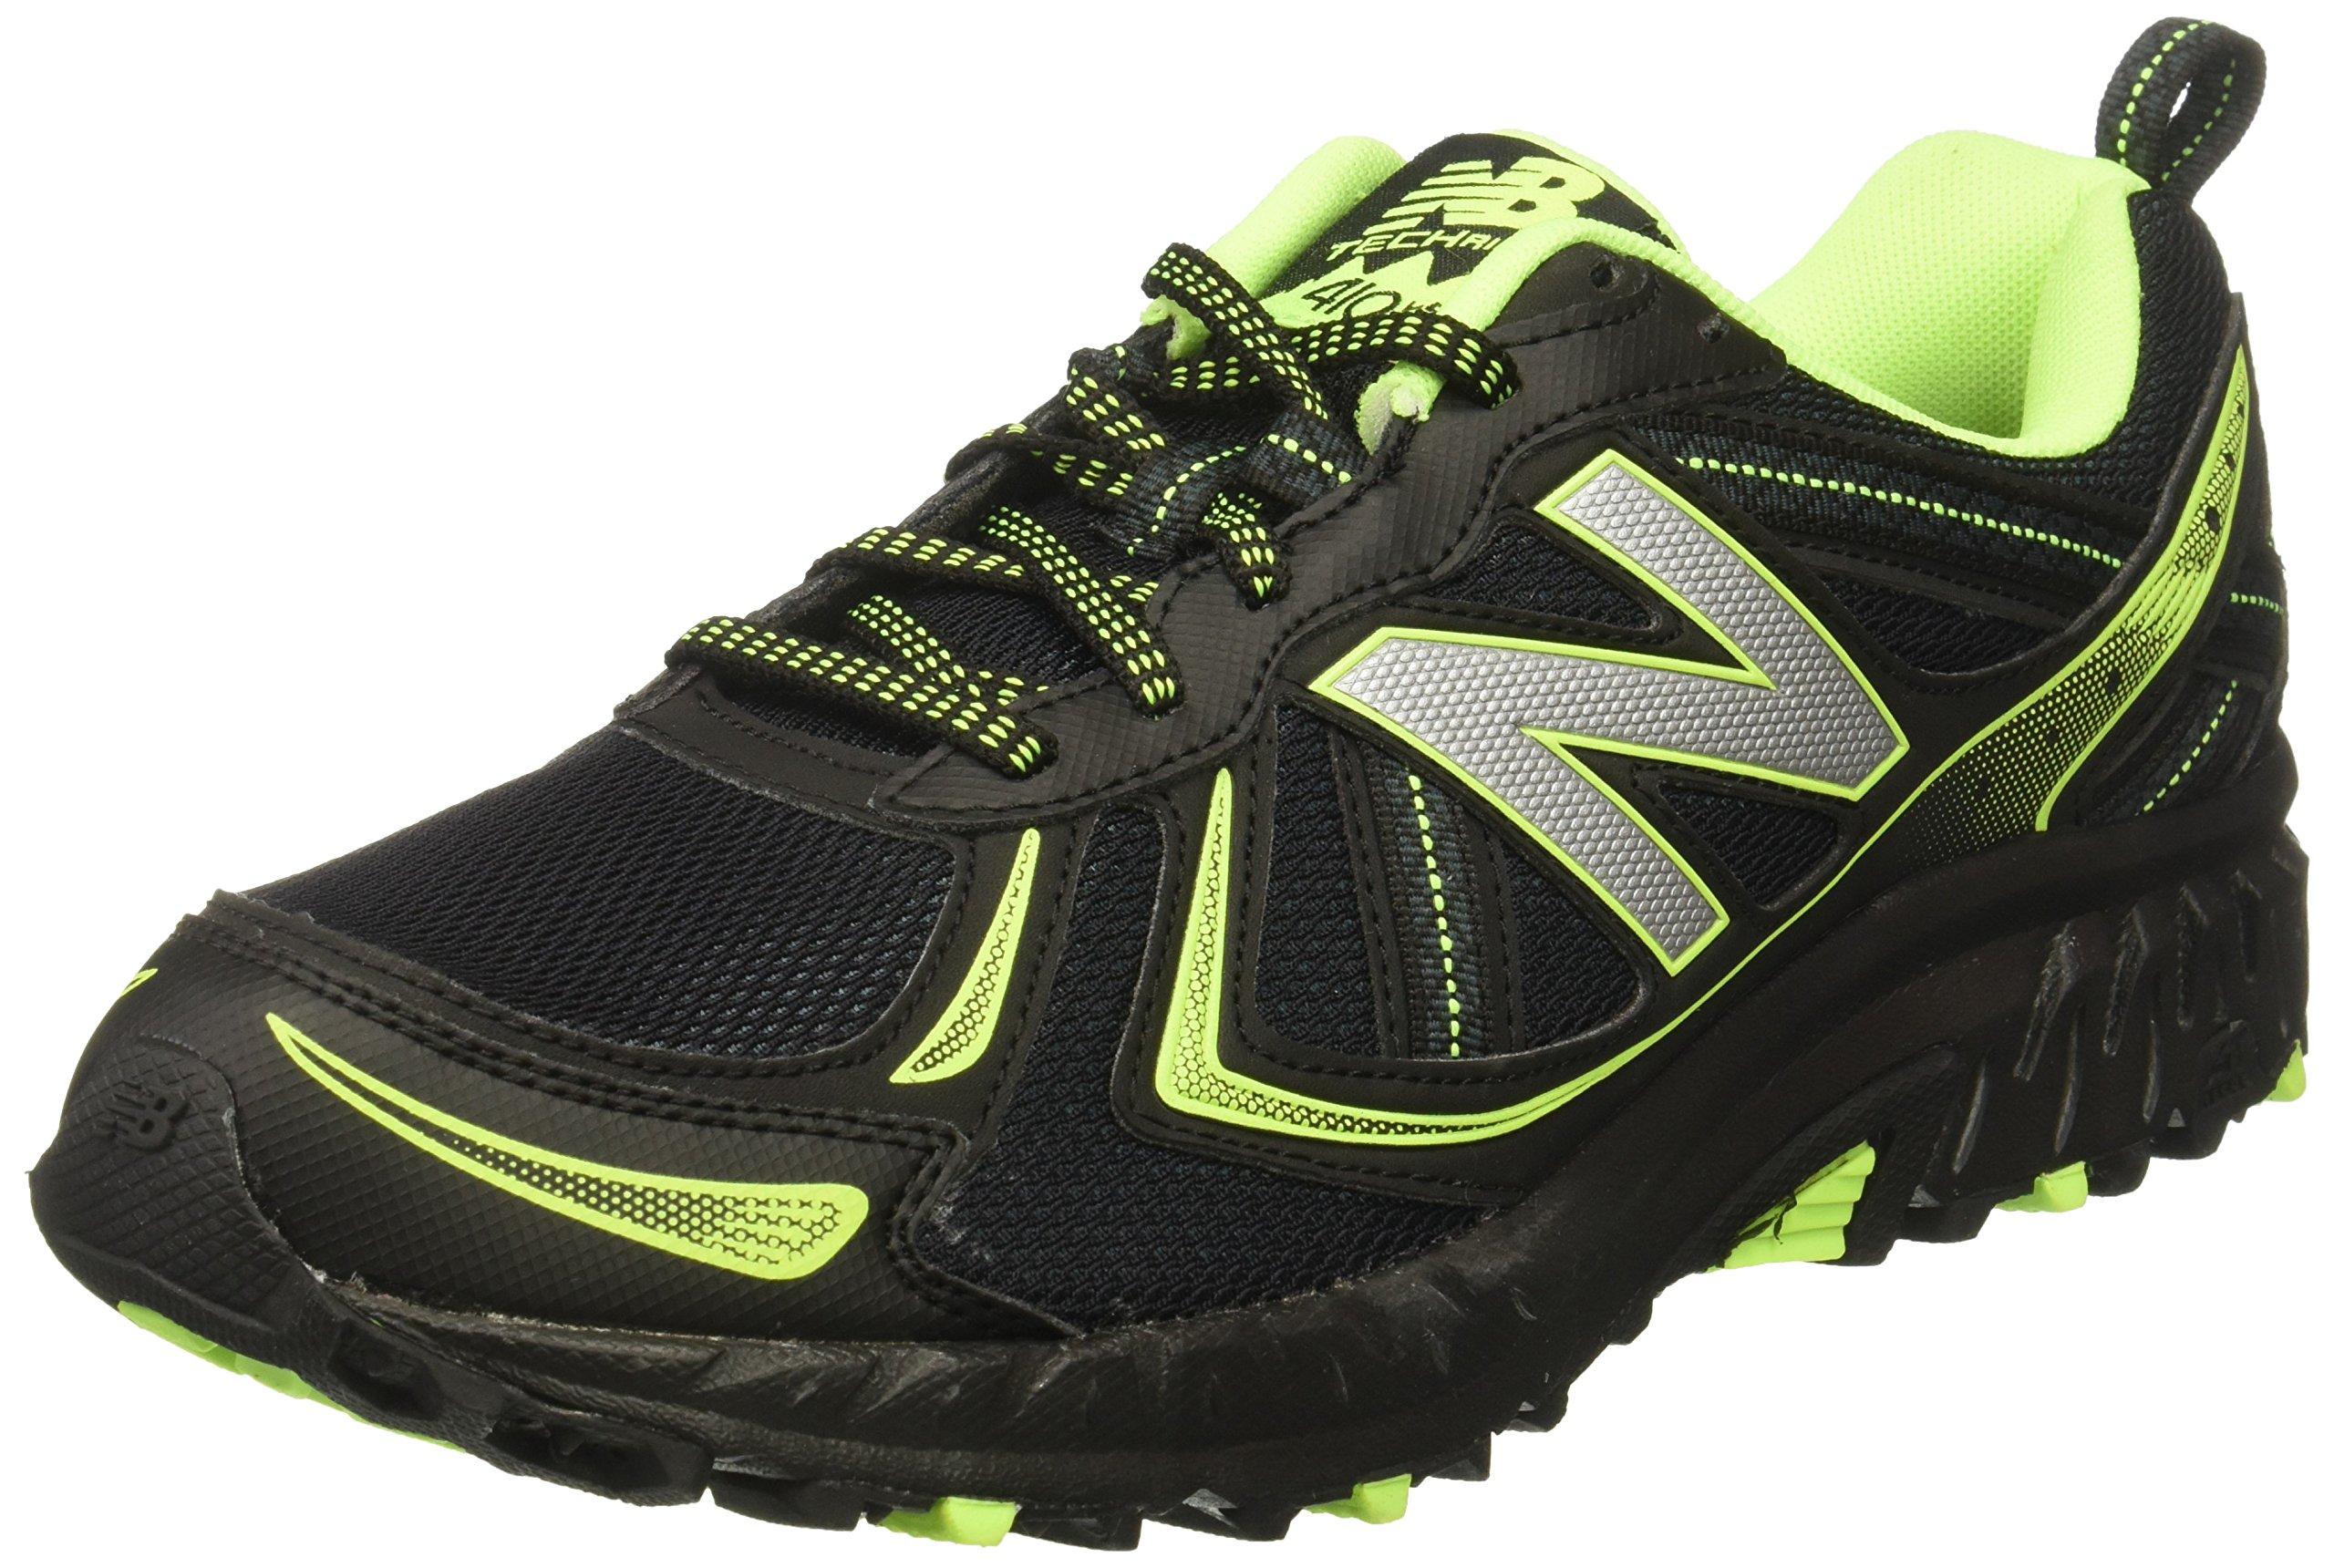 New Balance Men's MT410v5 Cushioning Trail Running Shoe, Black, 8 D US